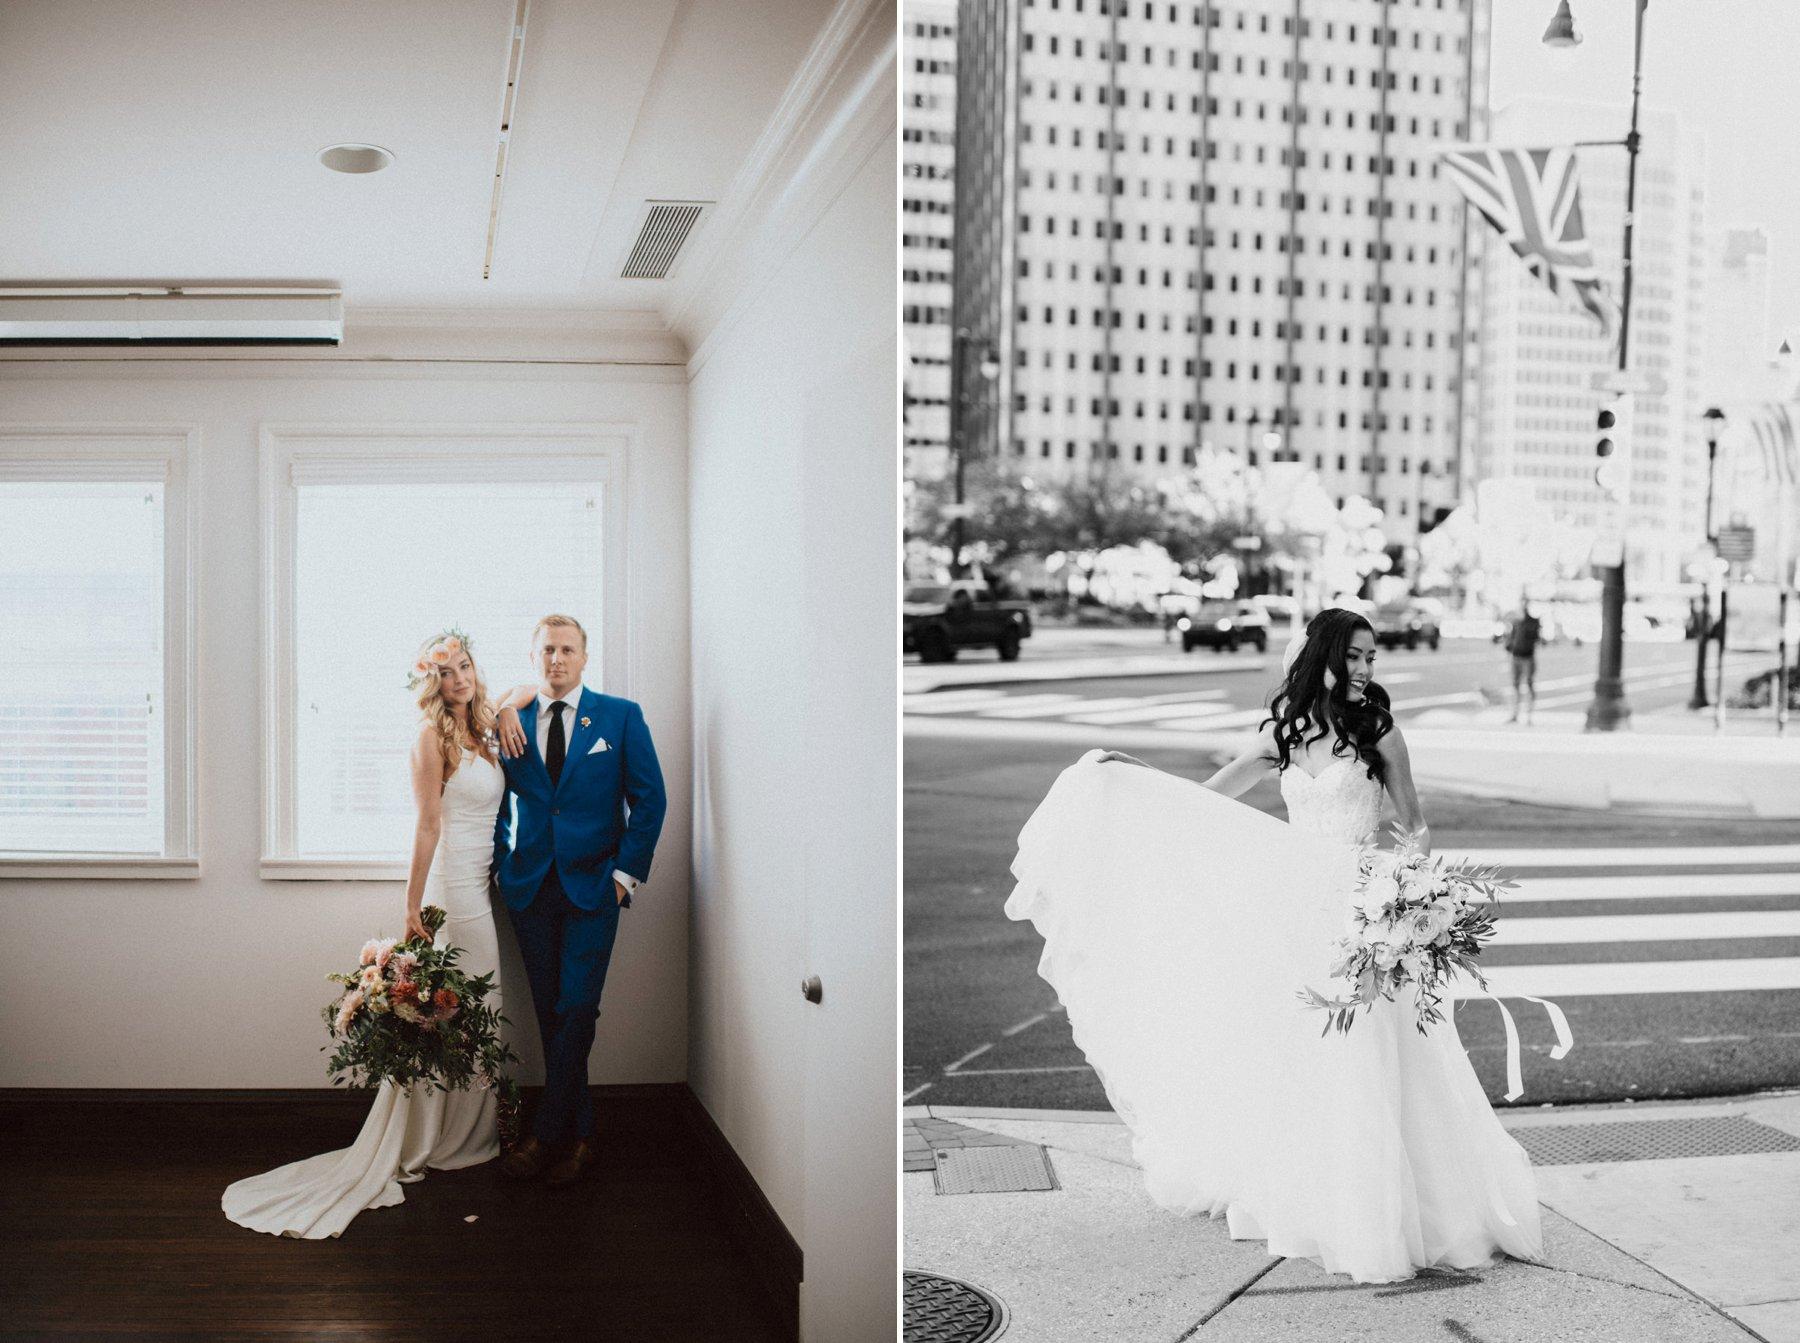 057-la-cherie-philly-wedding-7.jpg